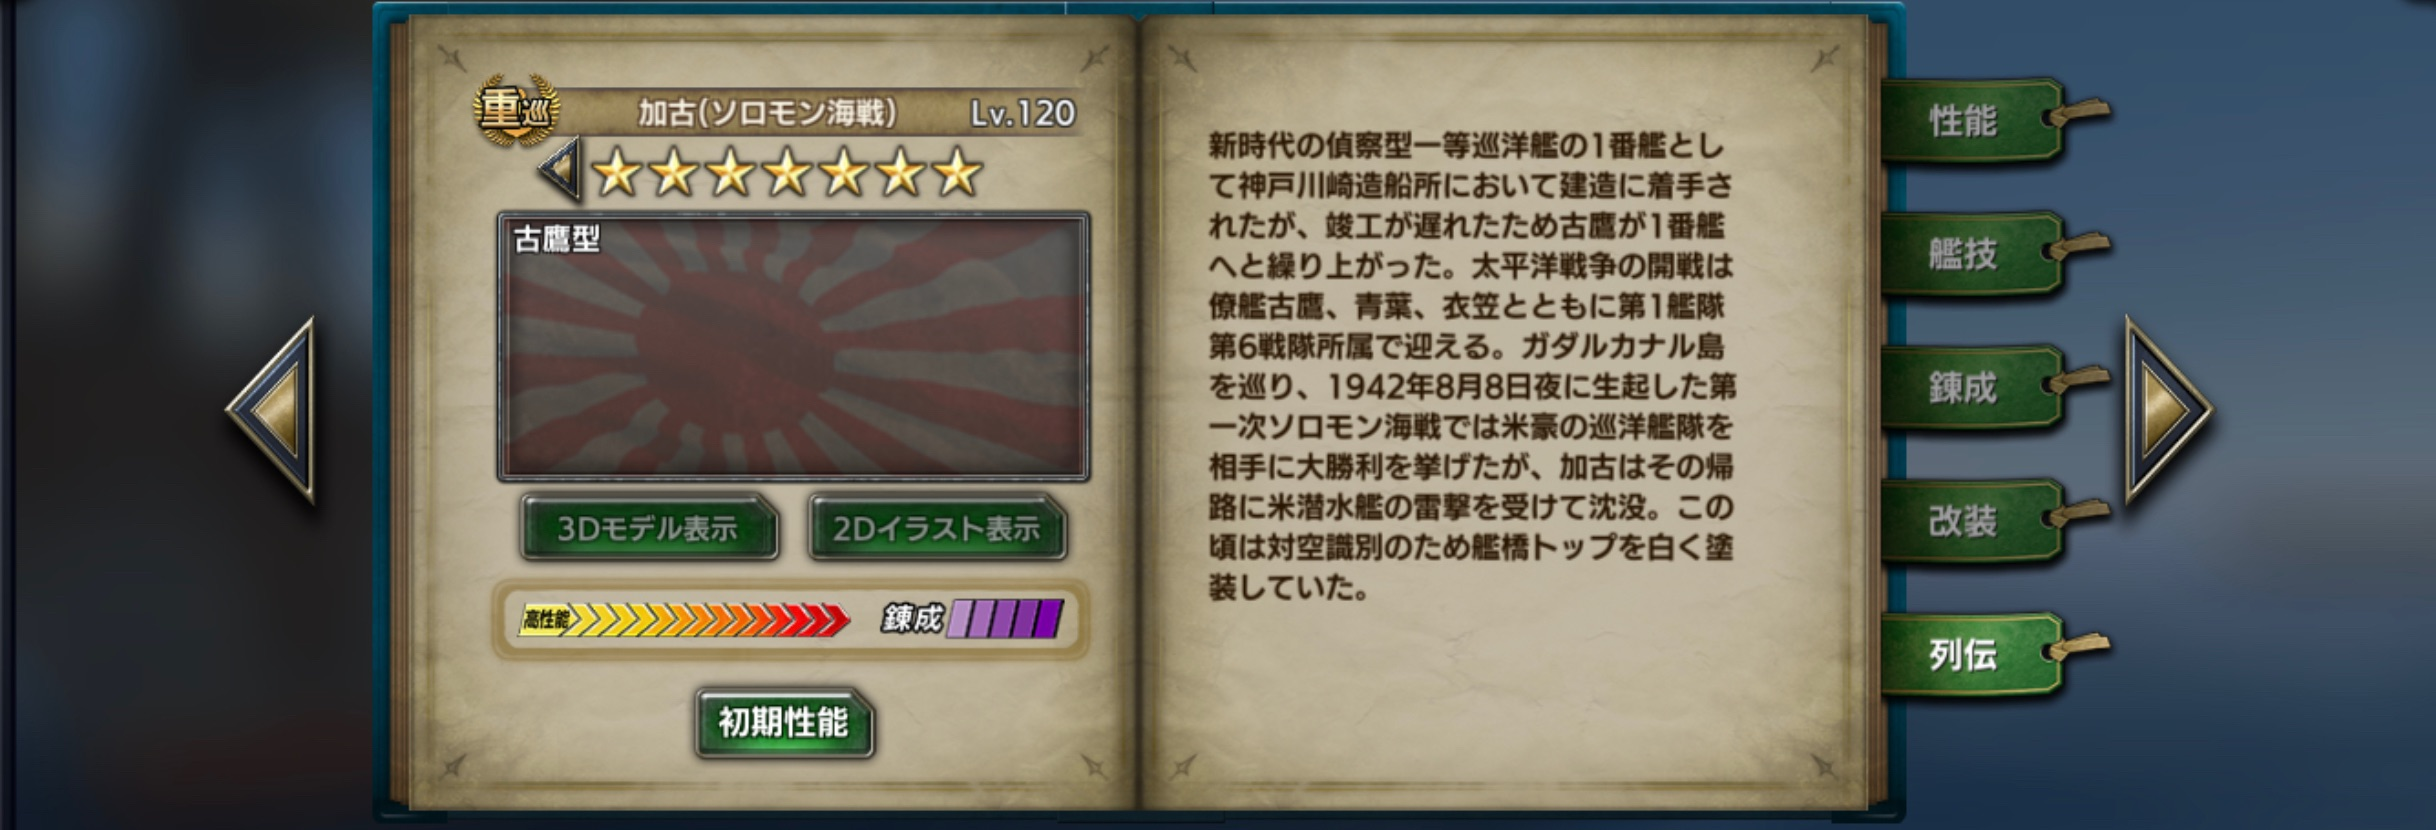 KakoS-history